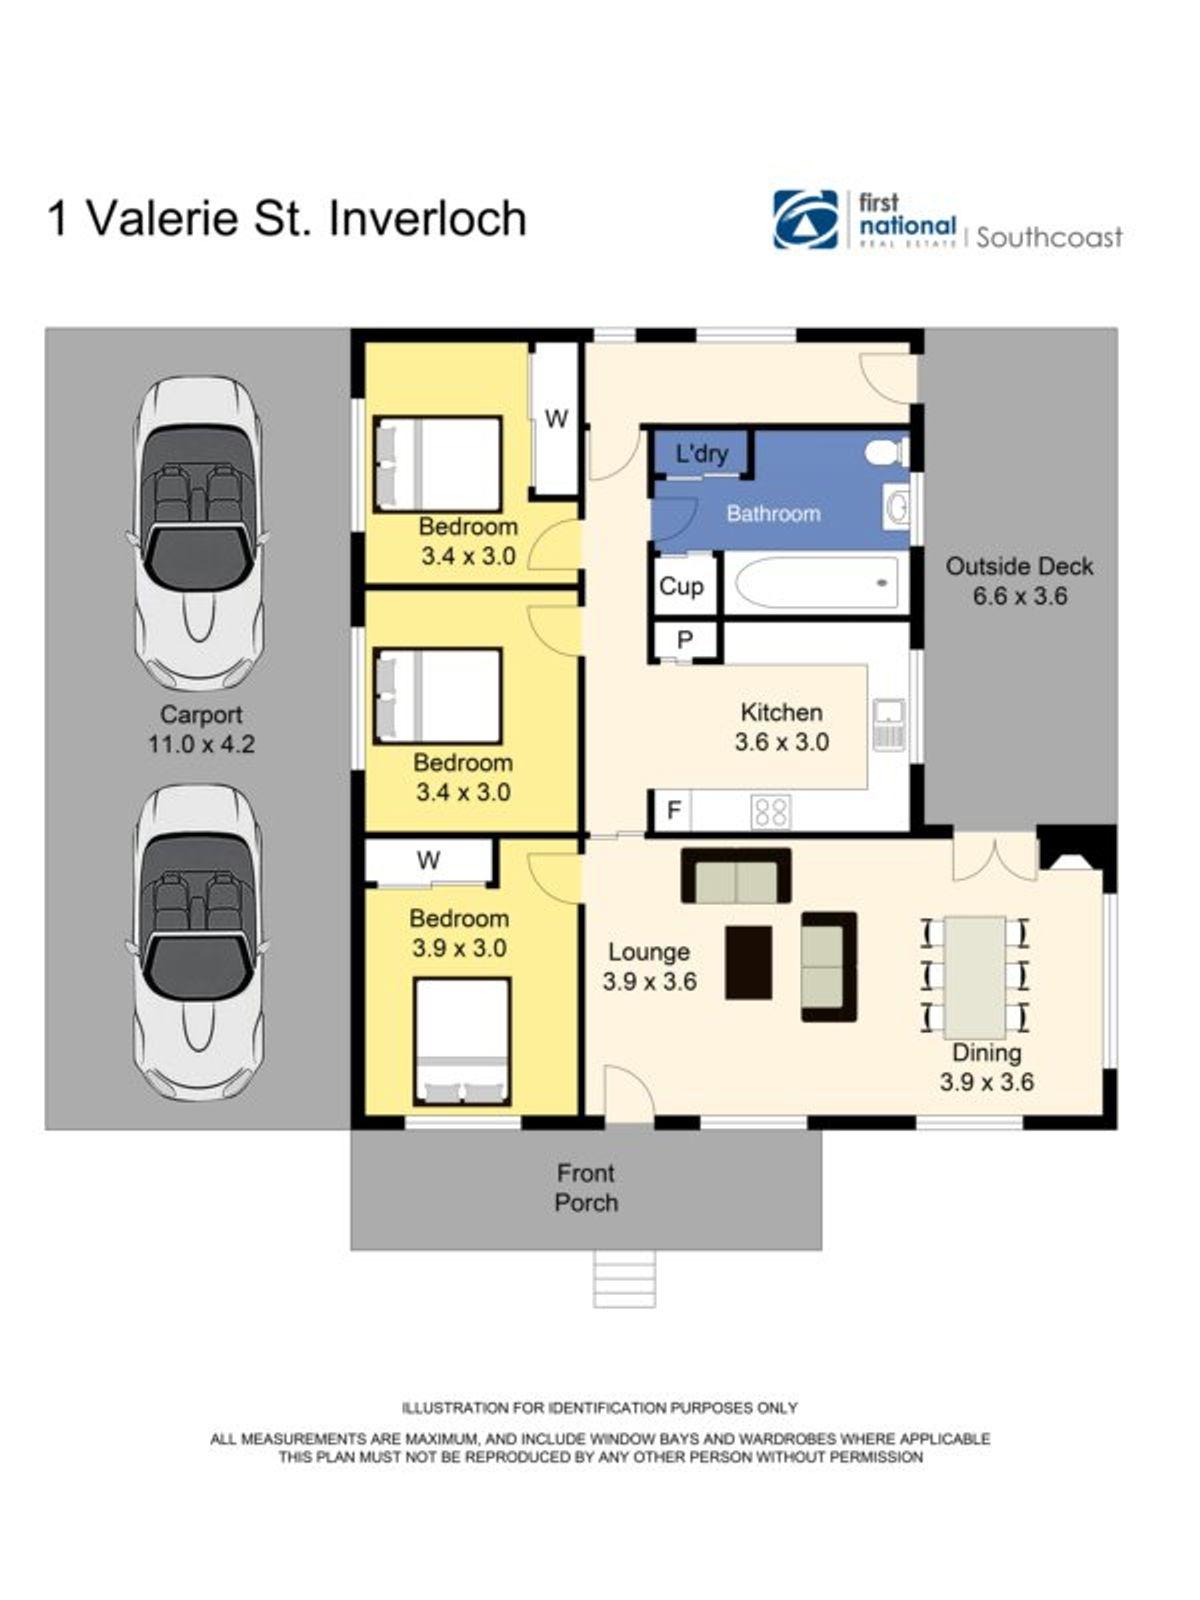 1 Valerie Street, Inverloch, VIC 3996